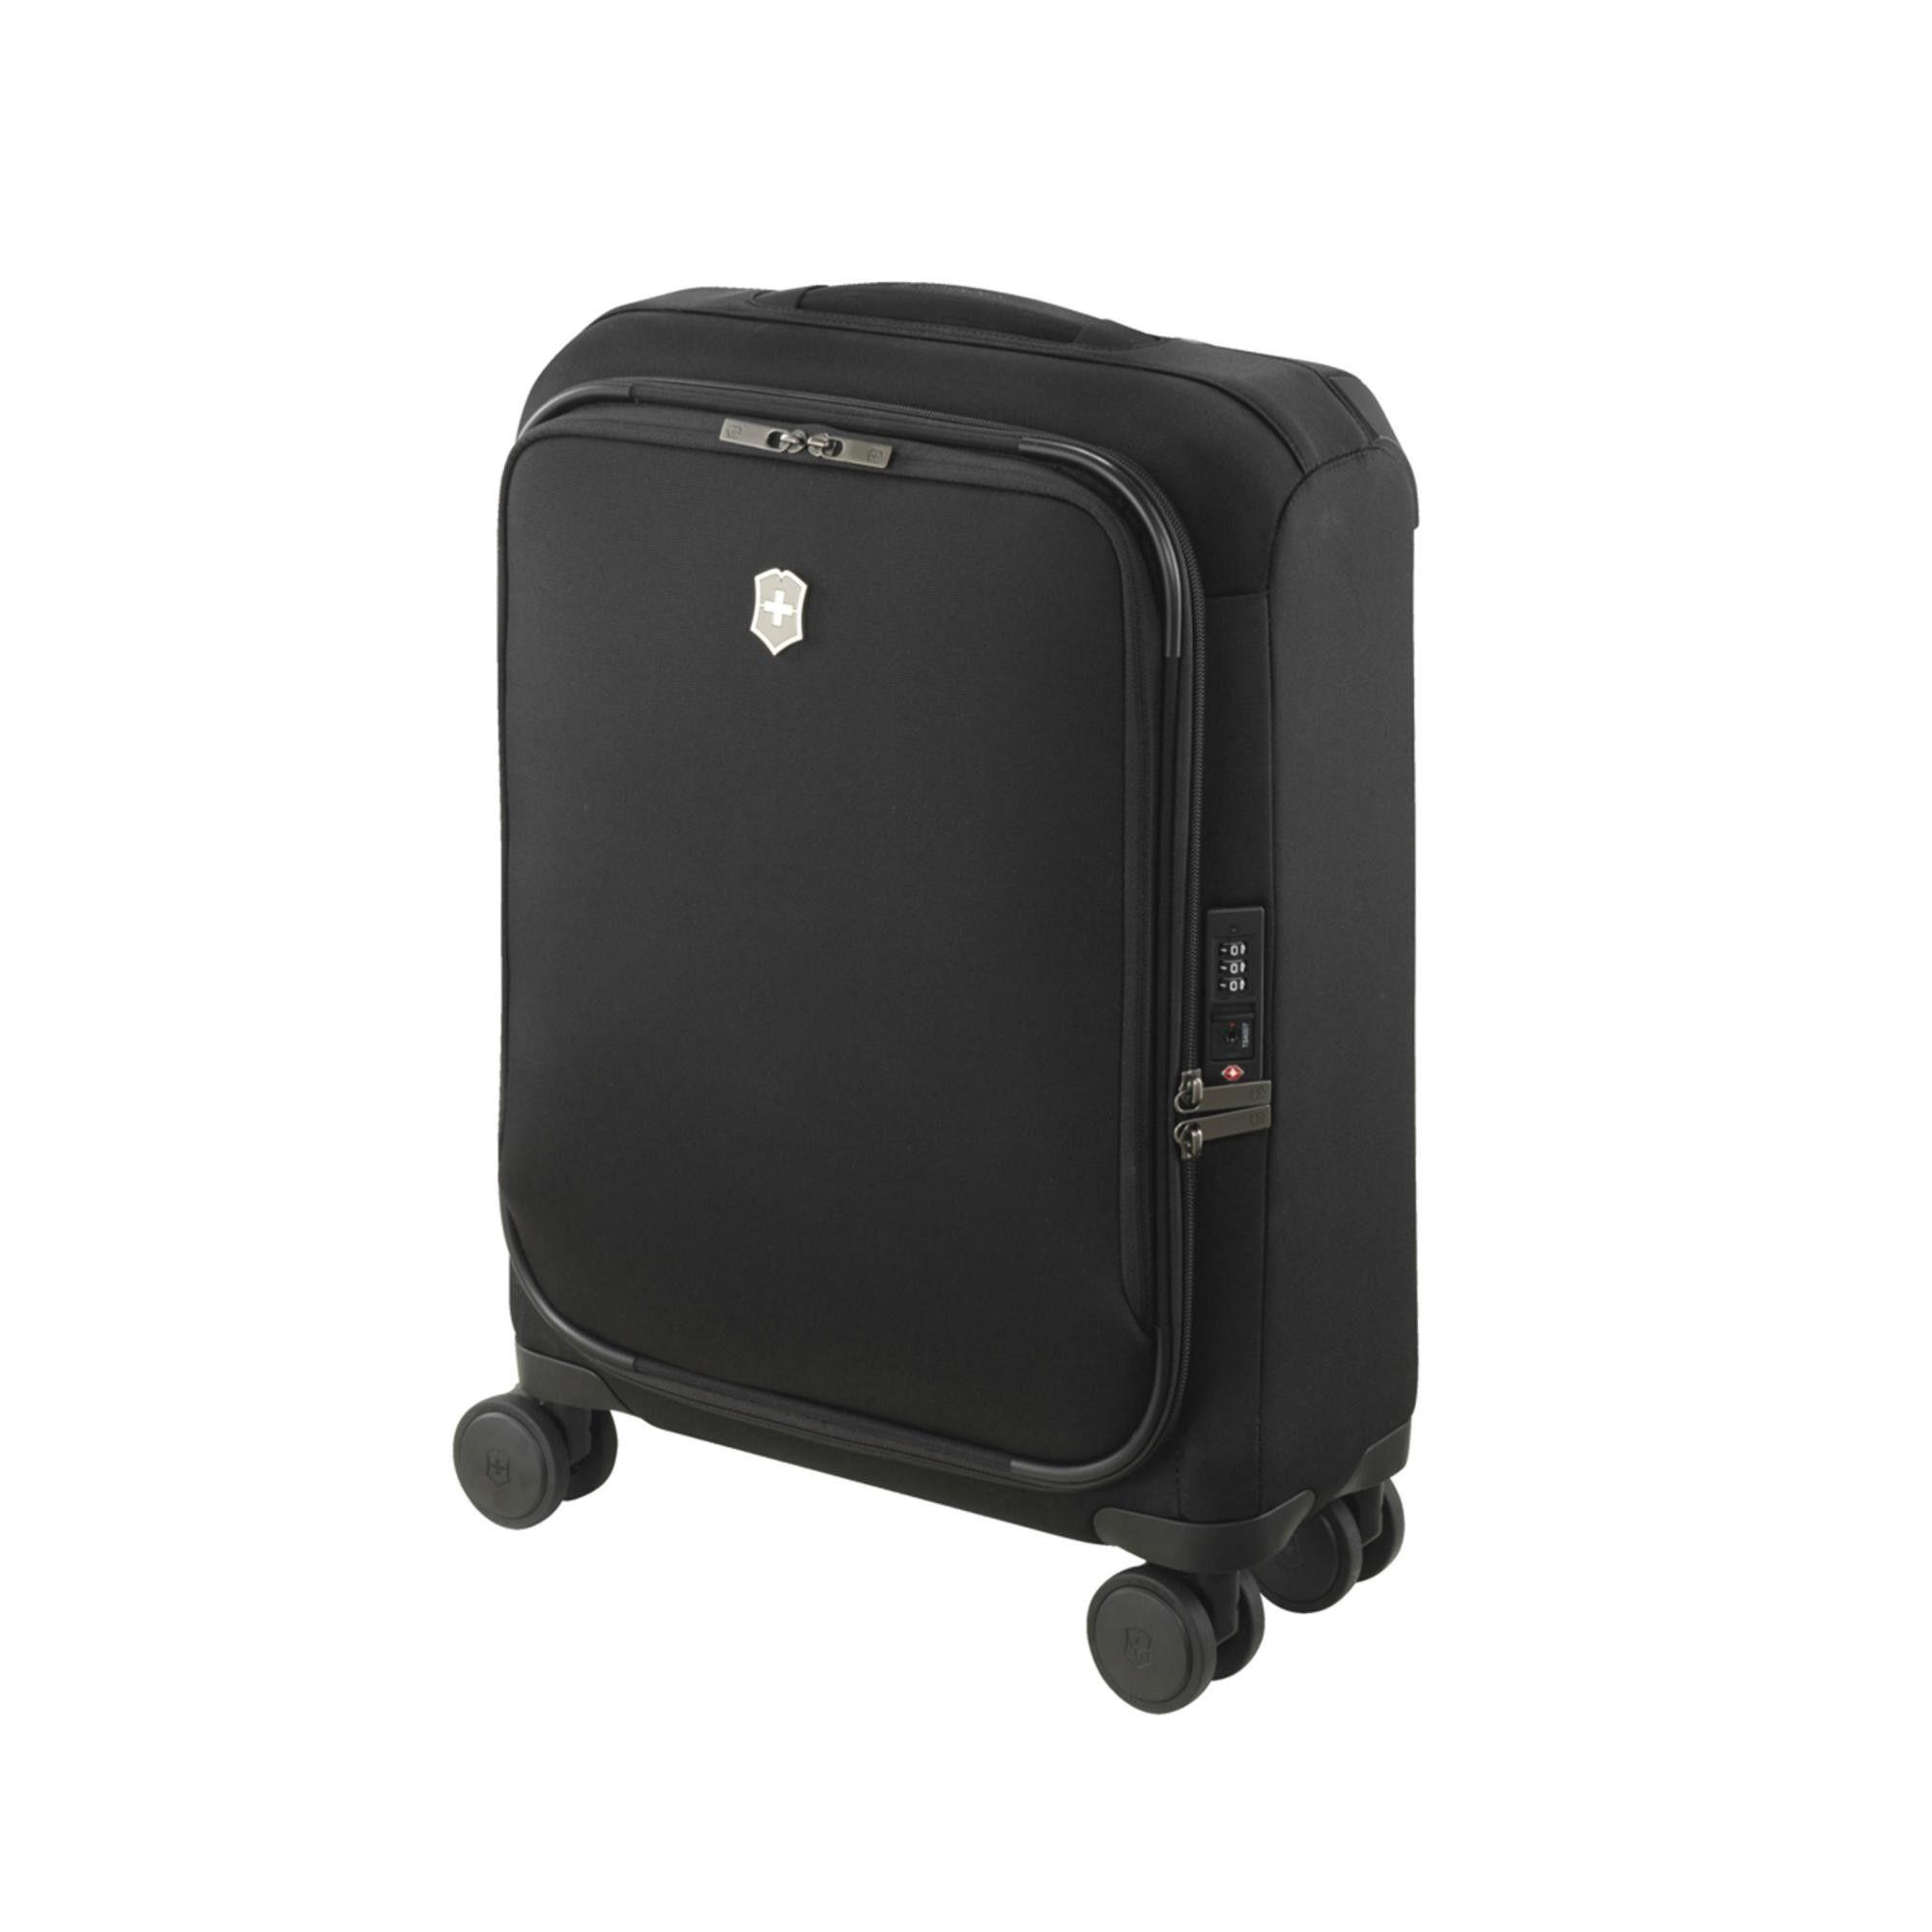 Mala de Viagem Connex Global Softside Carry-On Preta 28L Victorinox  - Mix Eletro